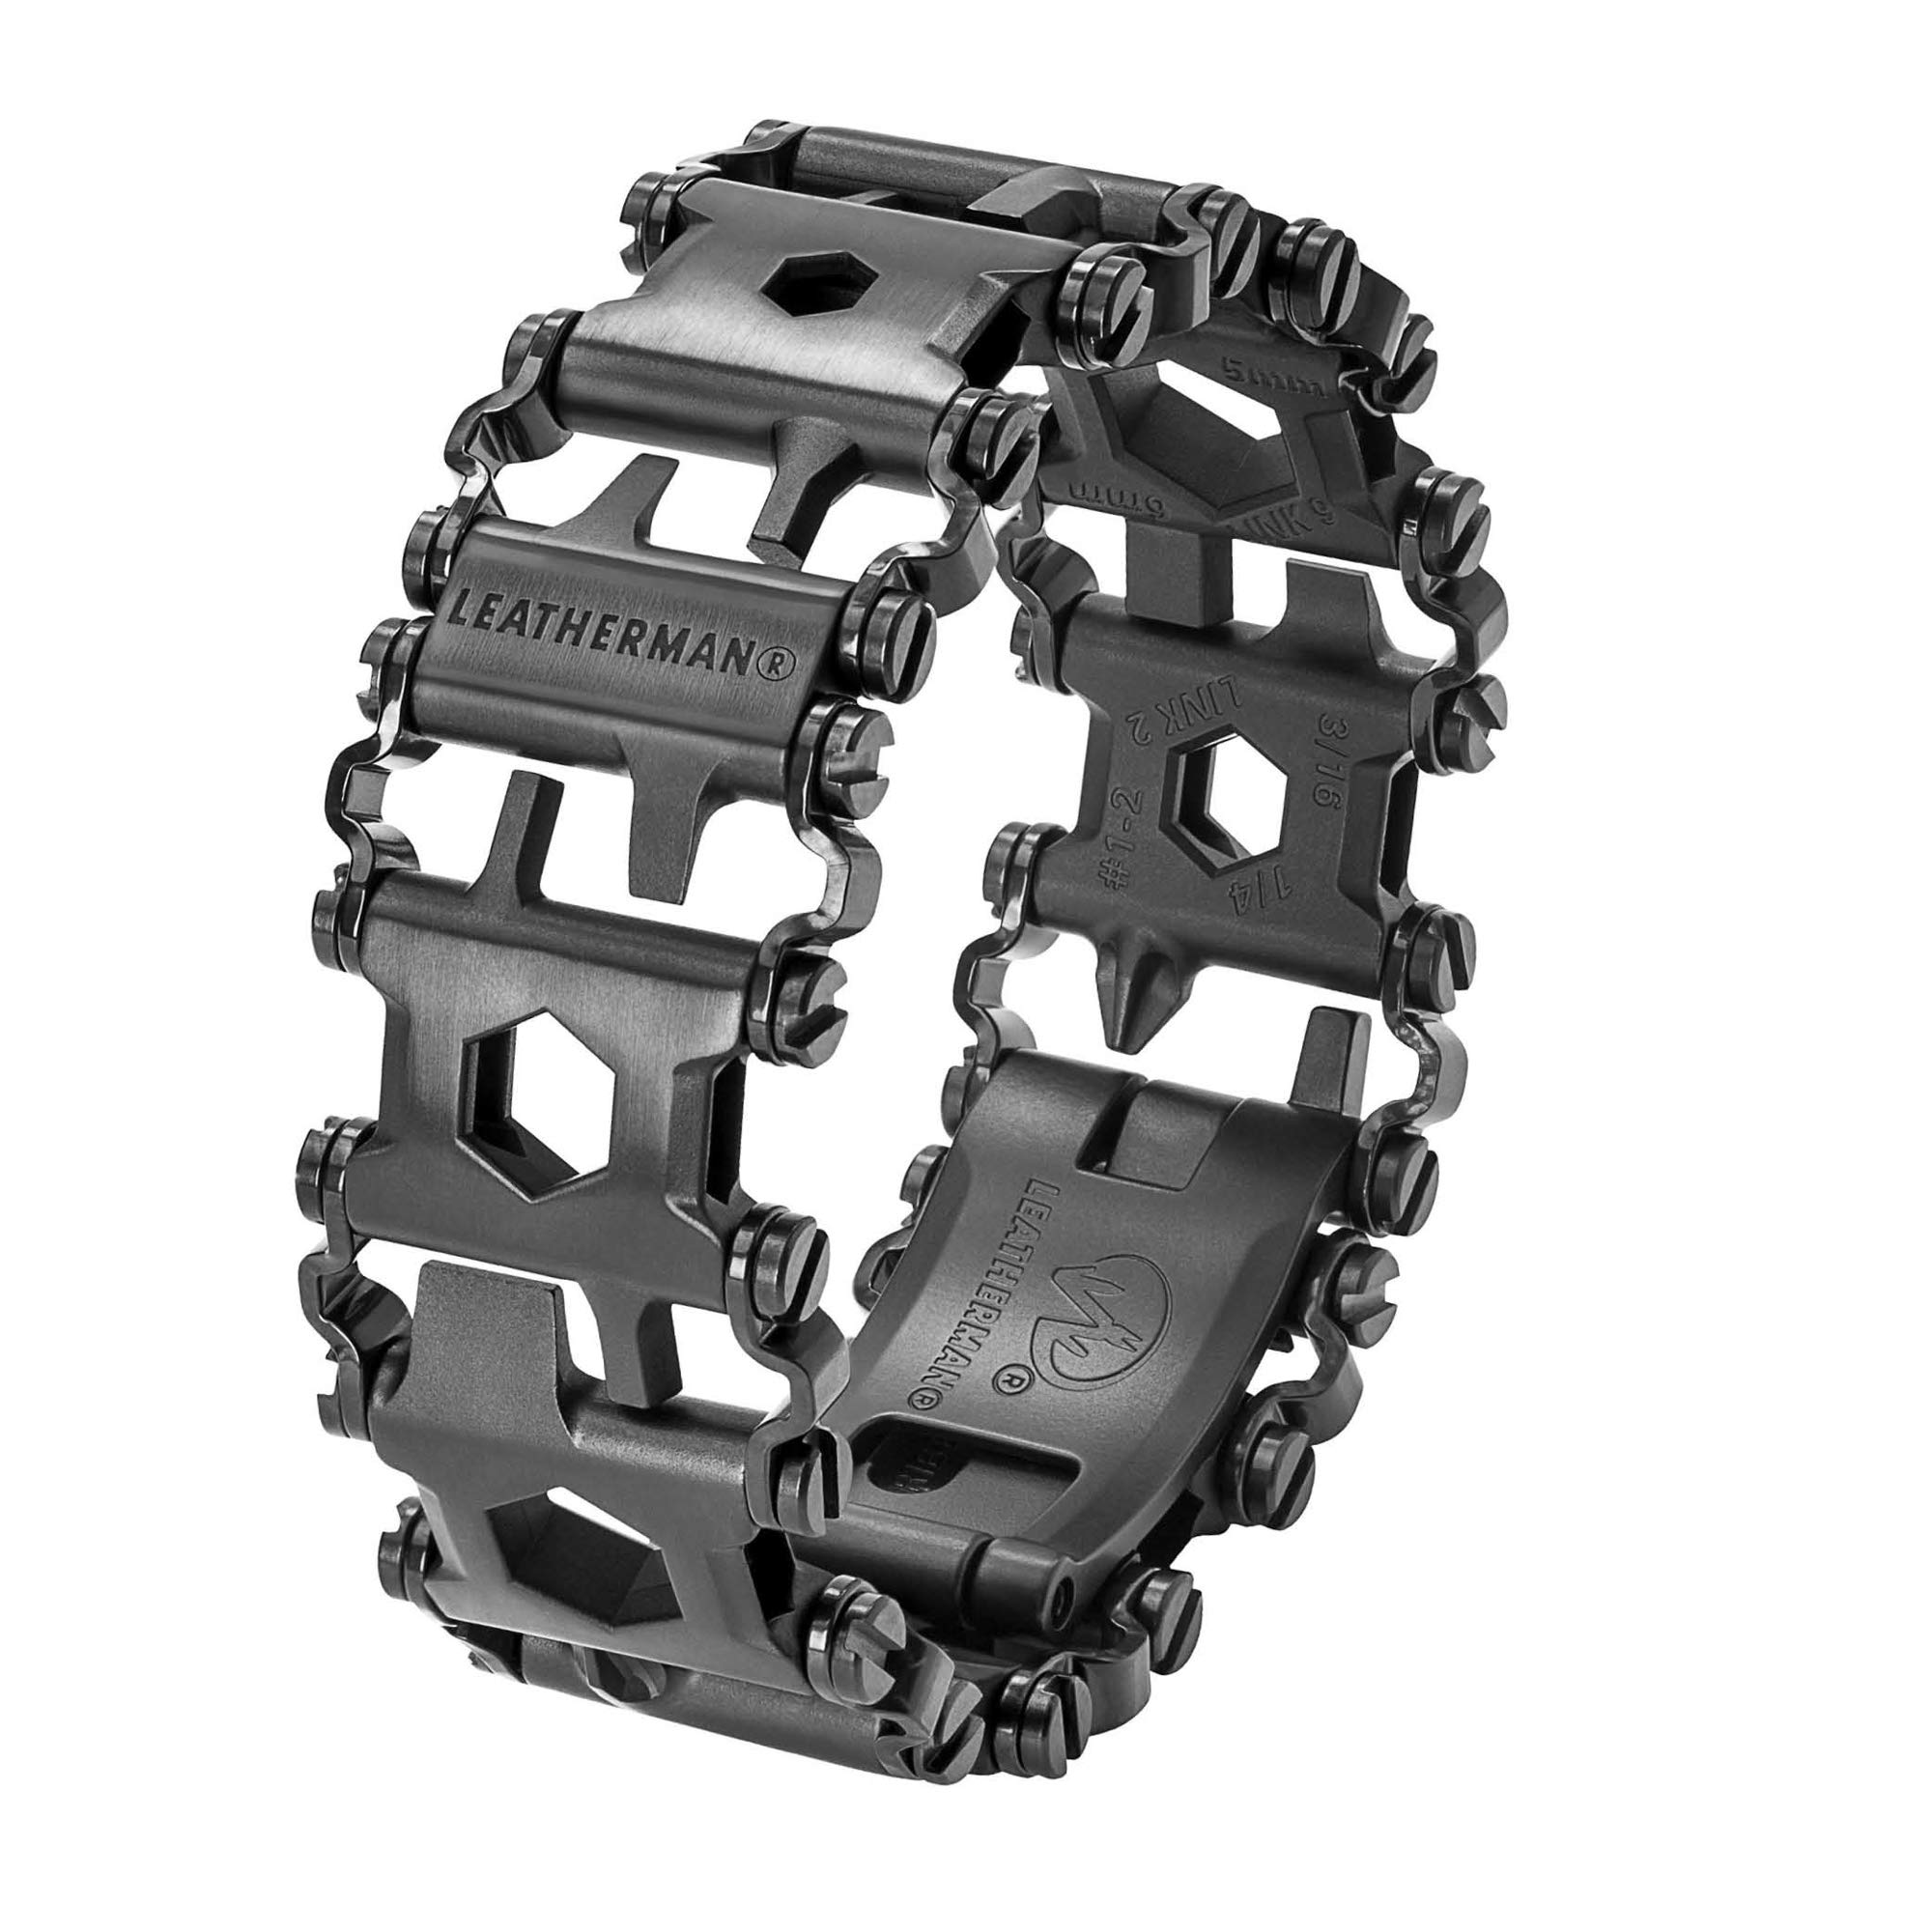 LEATHERMAN - Tread Bracelet, The Original Travel Friendly Wearable Multitool, Black by LEATHERMAN (Image #1)